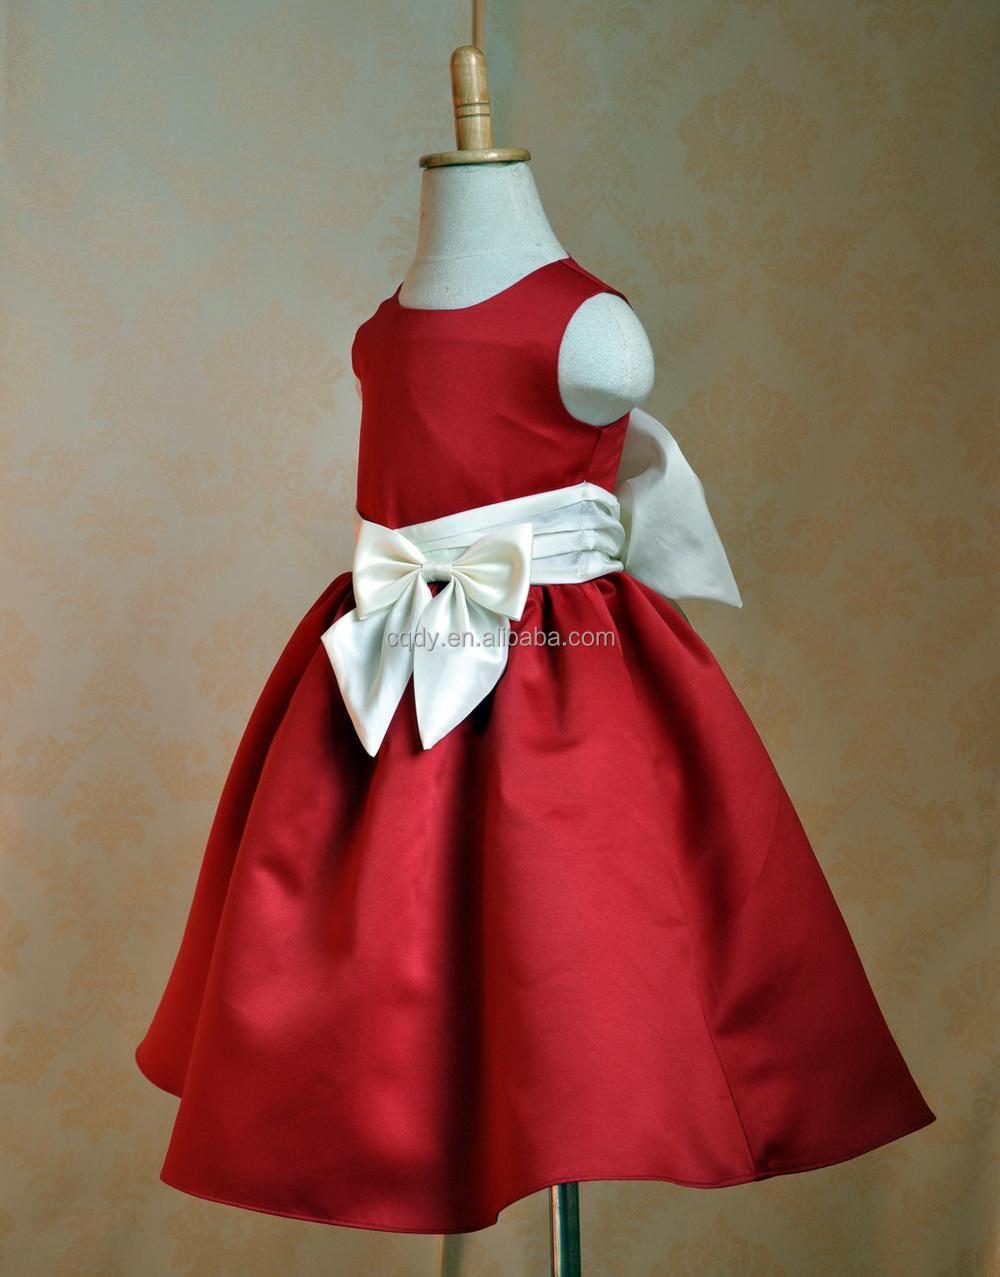 21549a770 Vestido De 2015 Para Navidad Vestidos Festival Bebé De Satén Chicas 54Lqj3AR